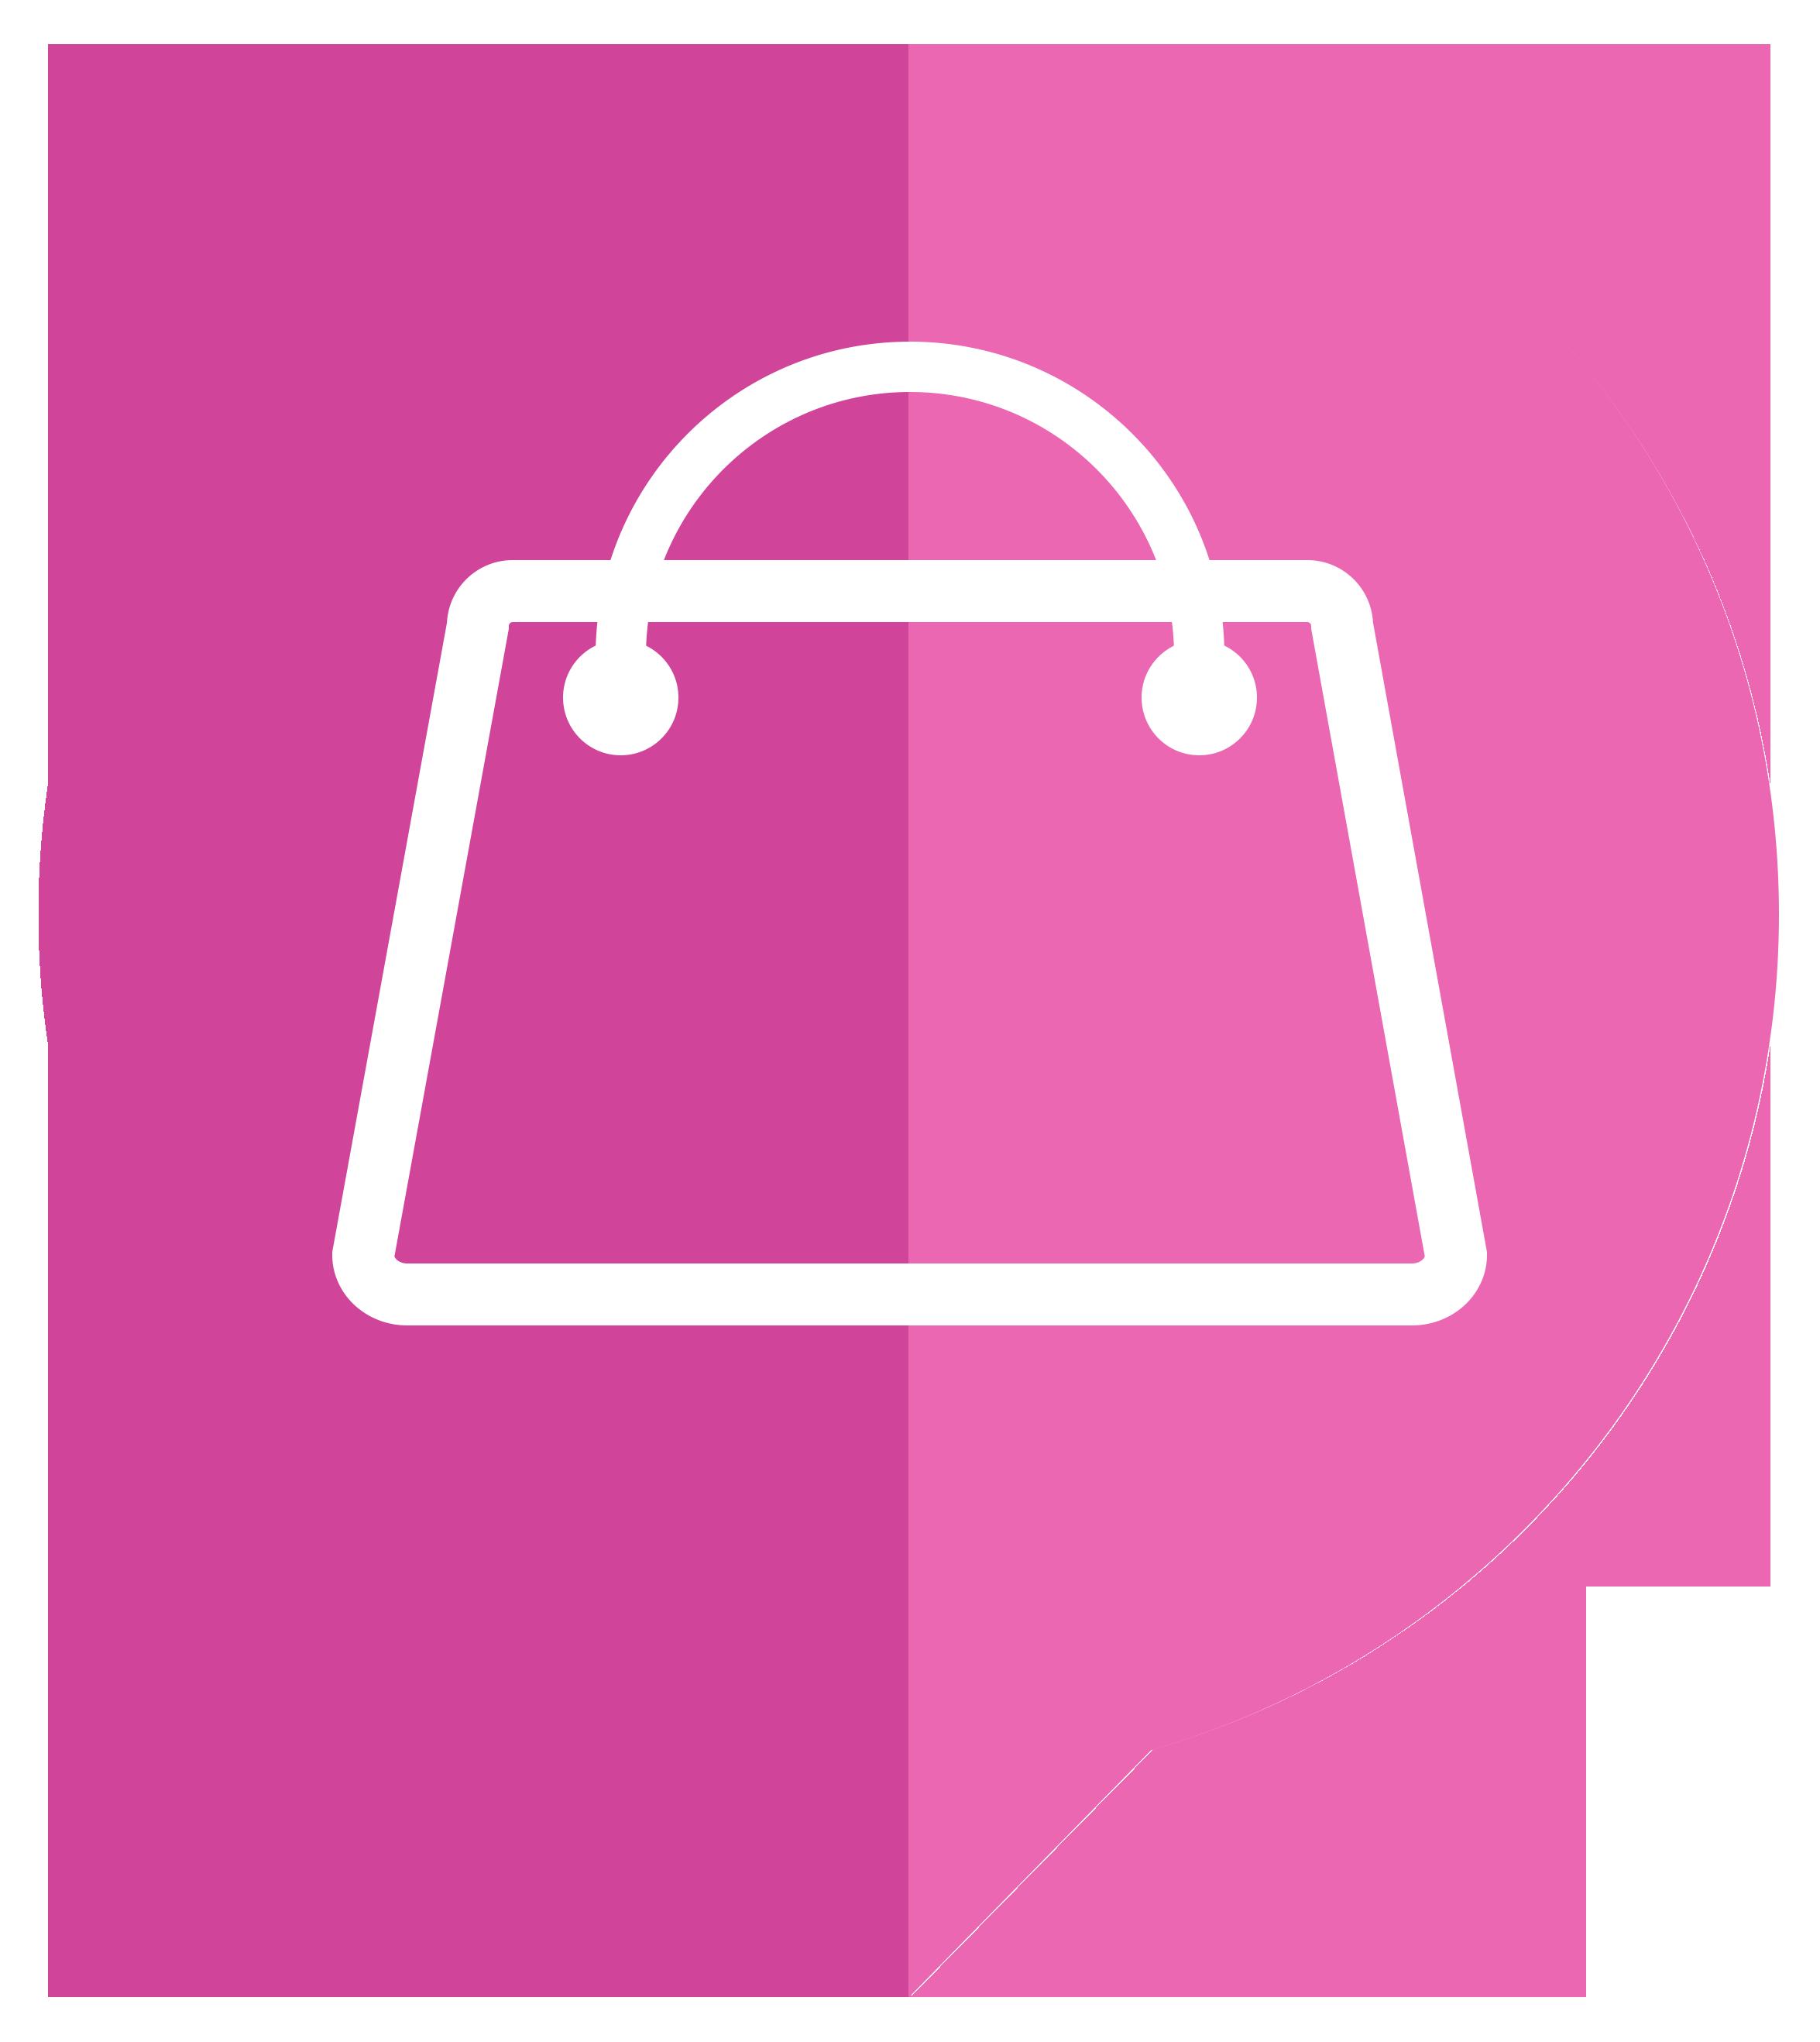 shoppinggai category search button